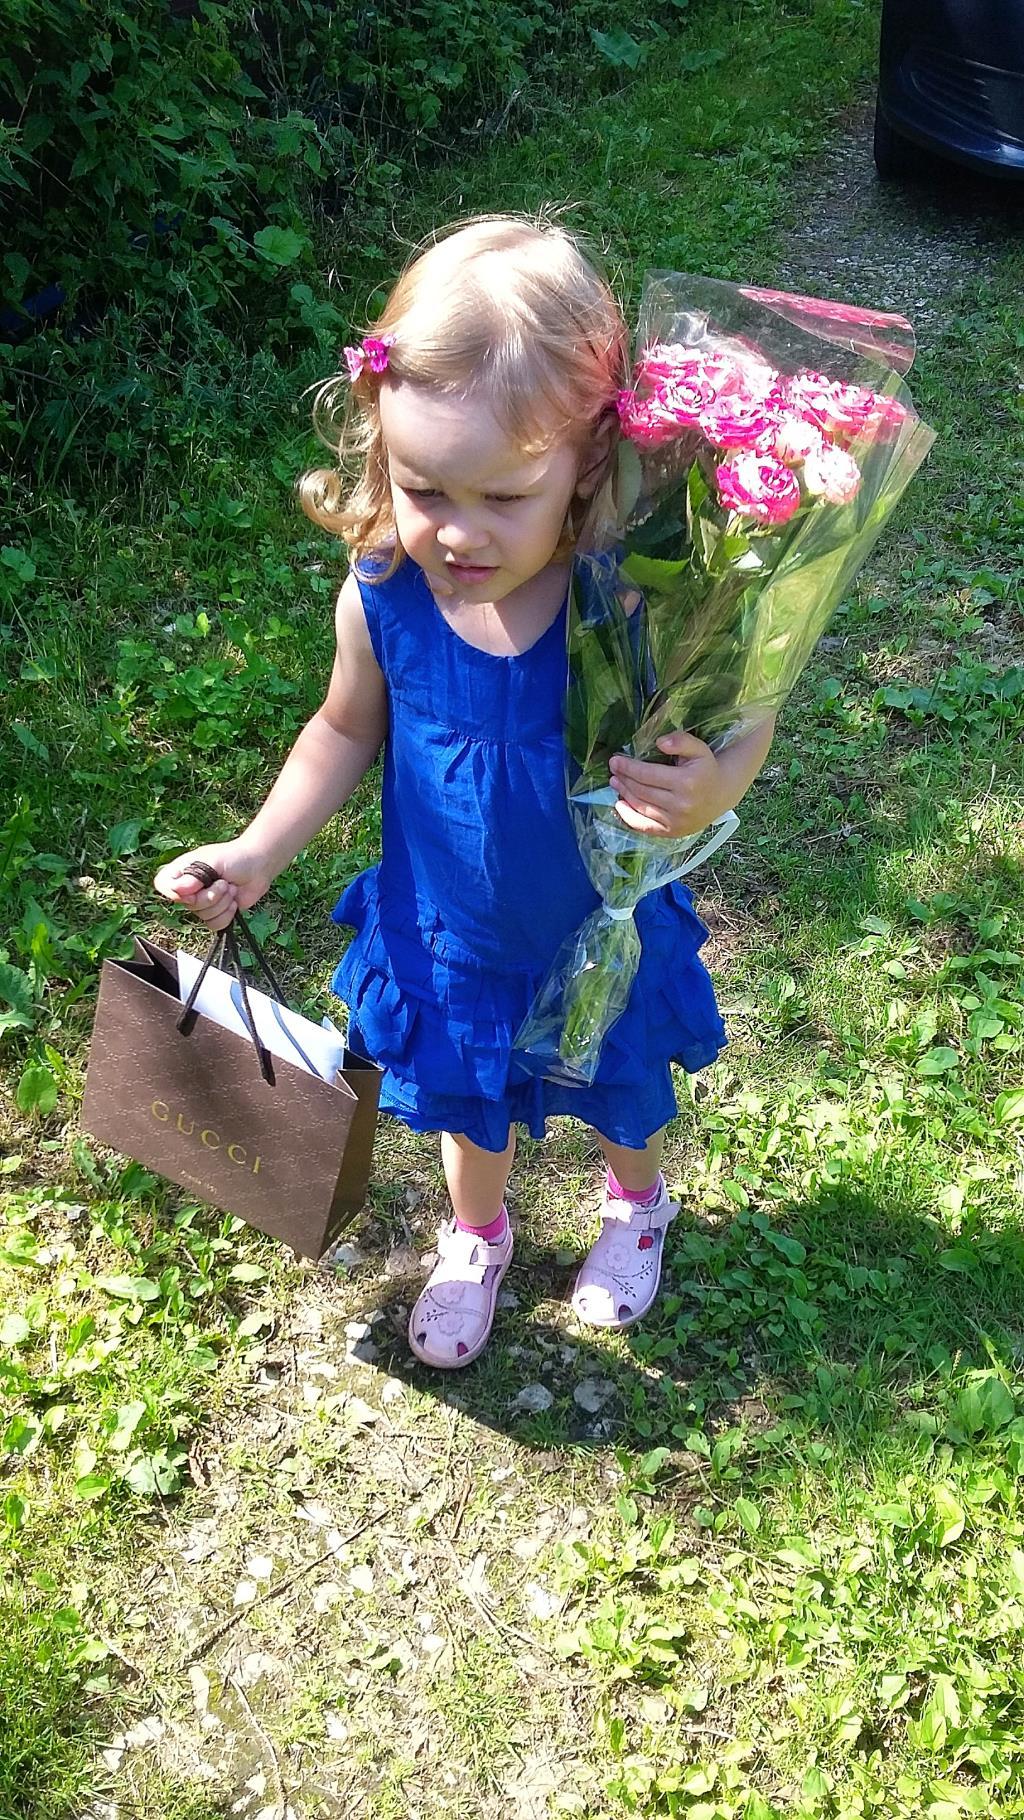 Принцесса на Дне рождения бабушки. Принцесса собирается на бал